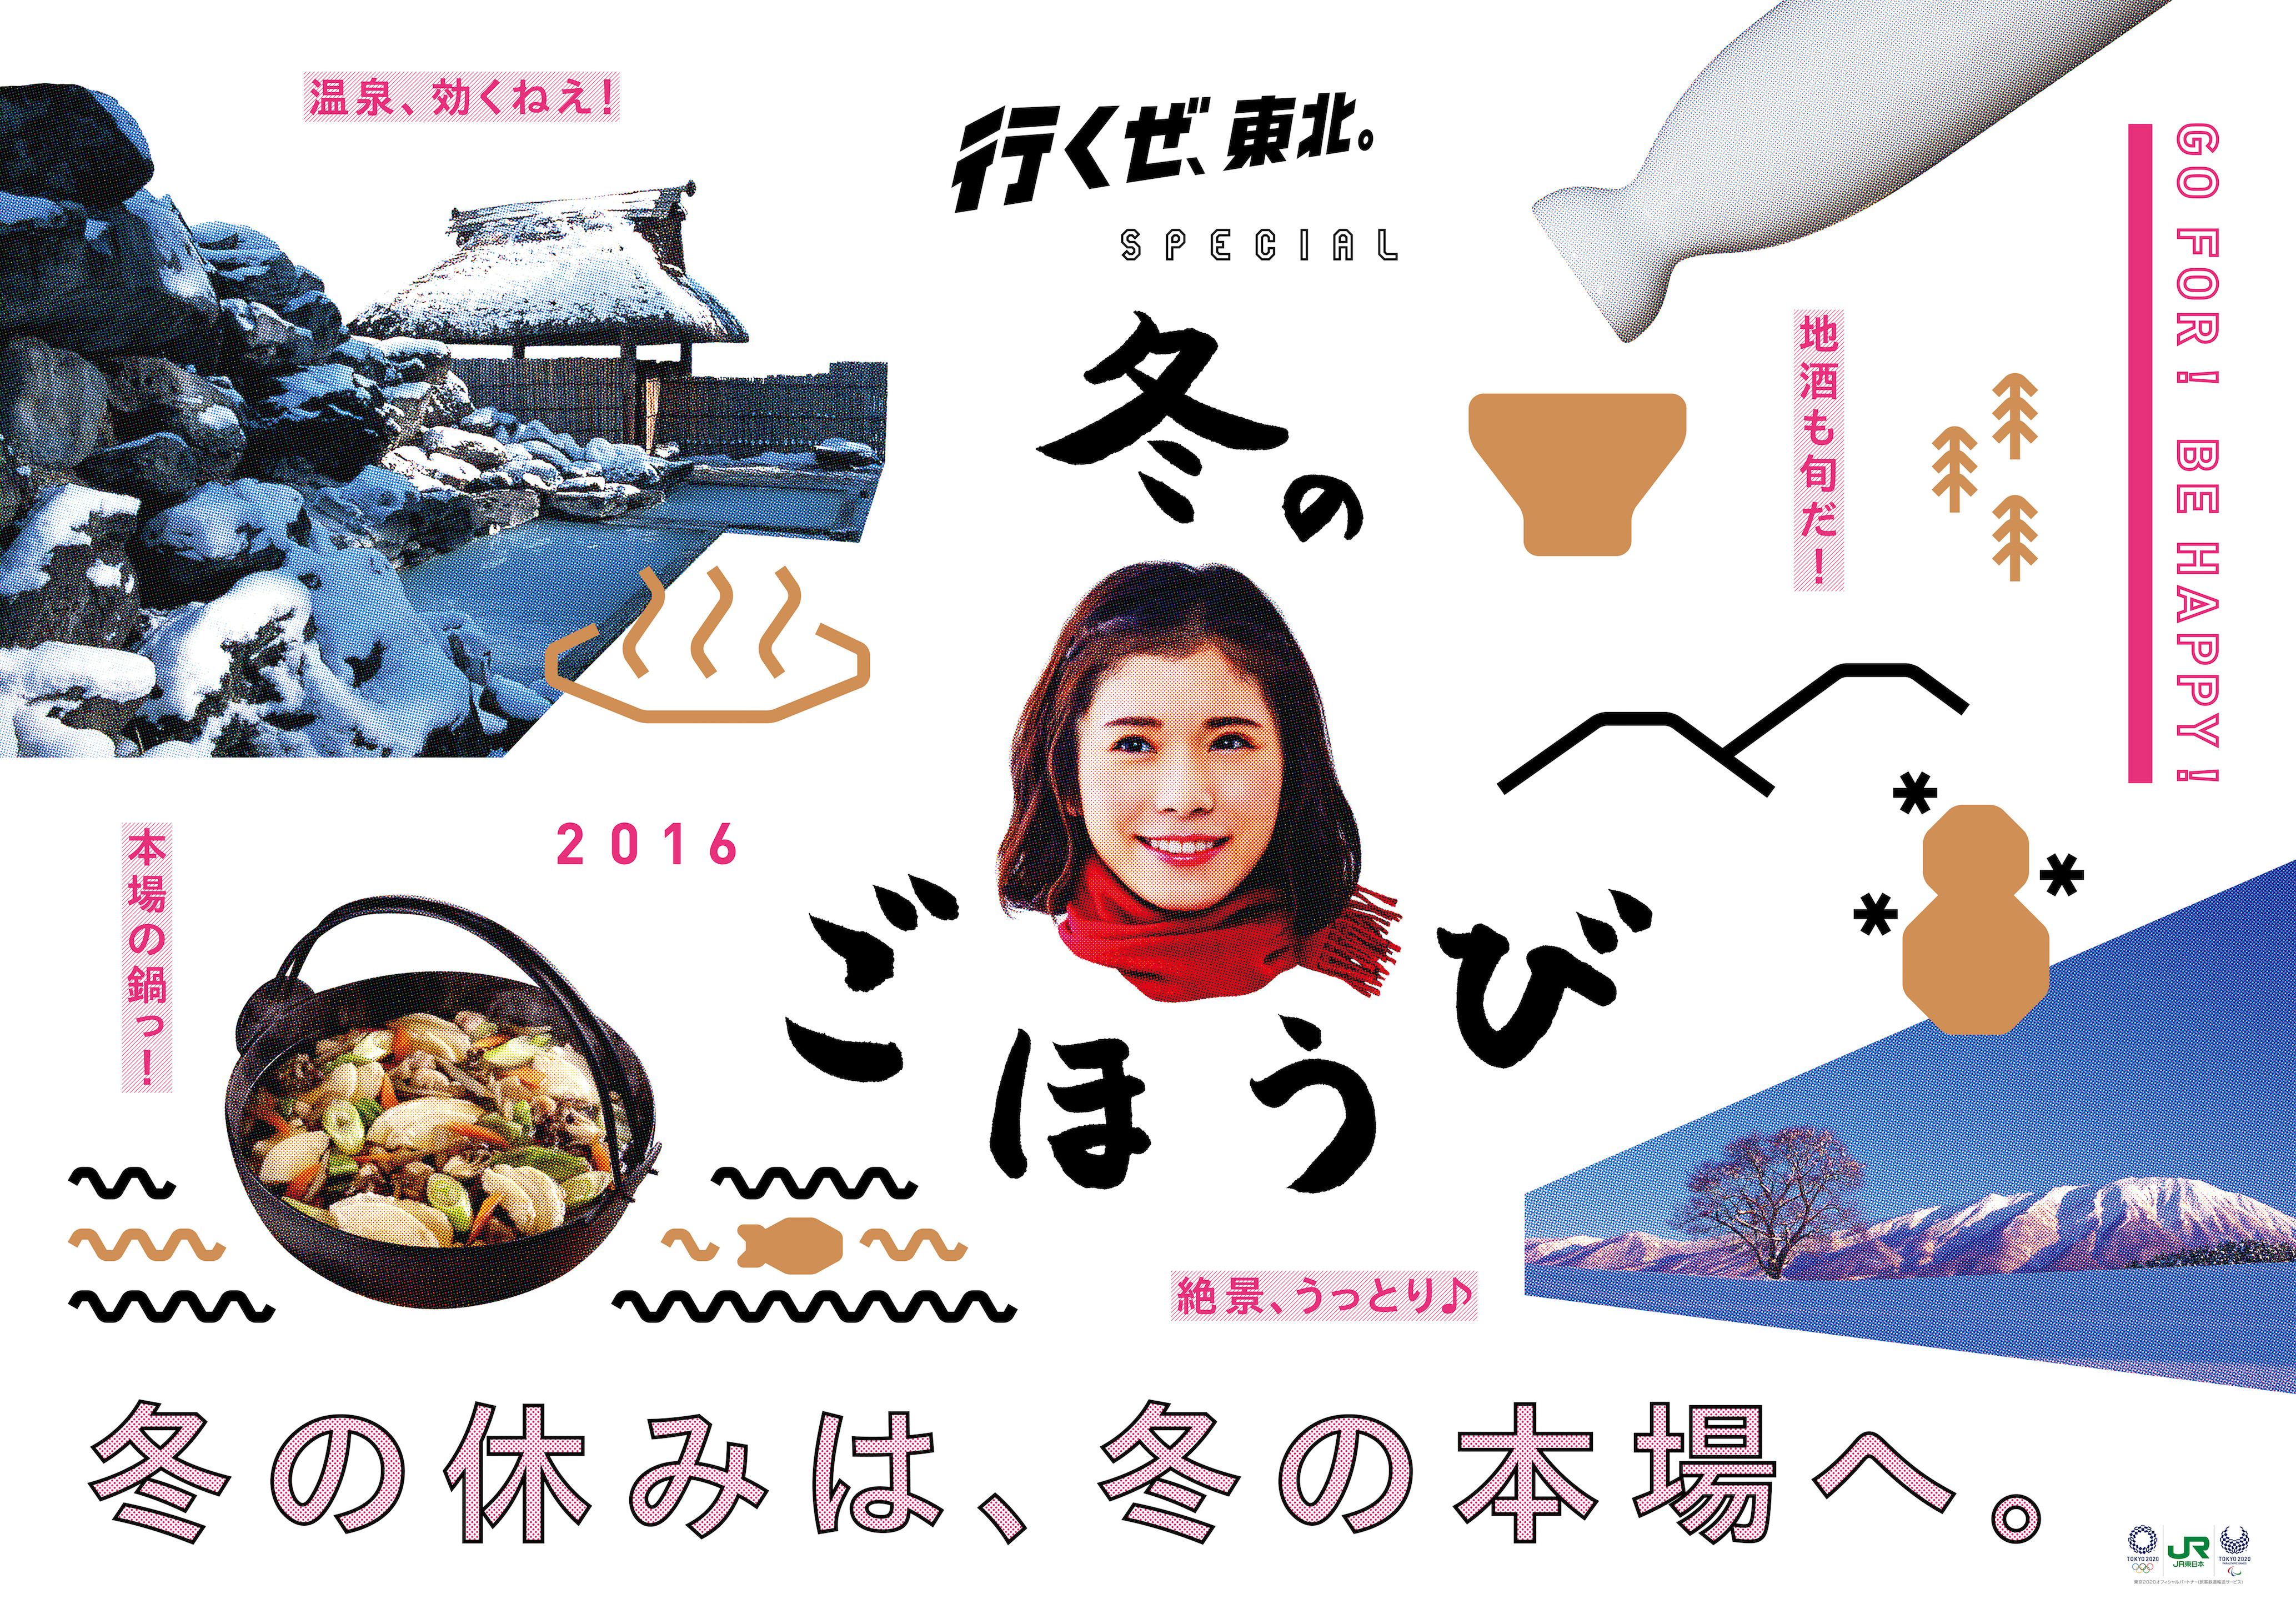 JR_ikuze_2016_fuyunogohobi_B0poster_161025_fin_ol